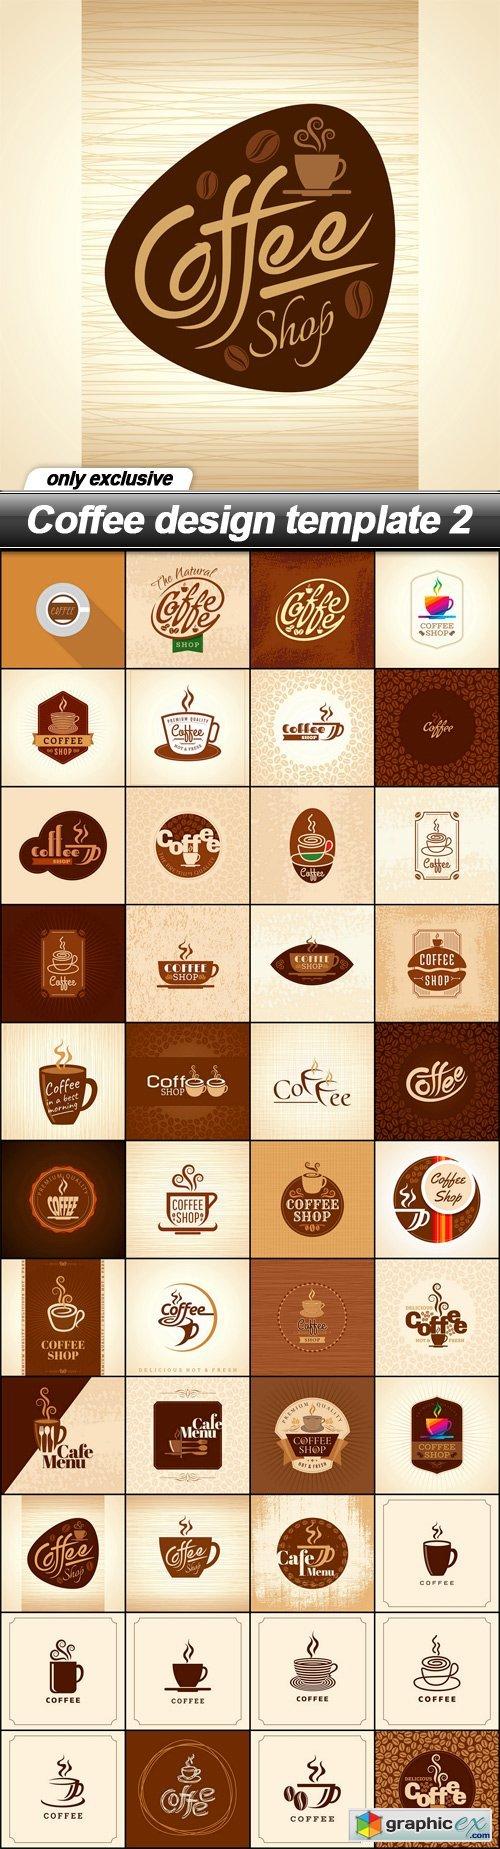 Coffee design template 2 - 44 EPS